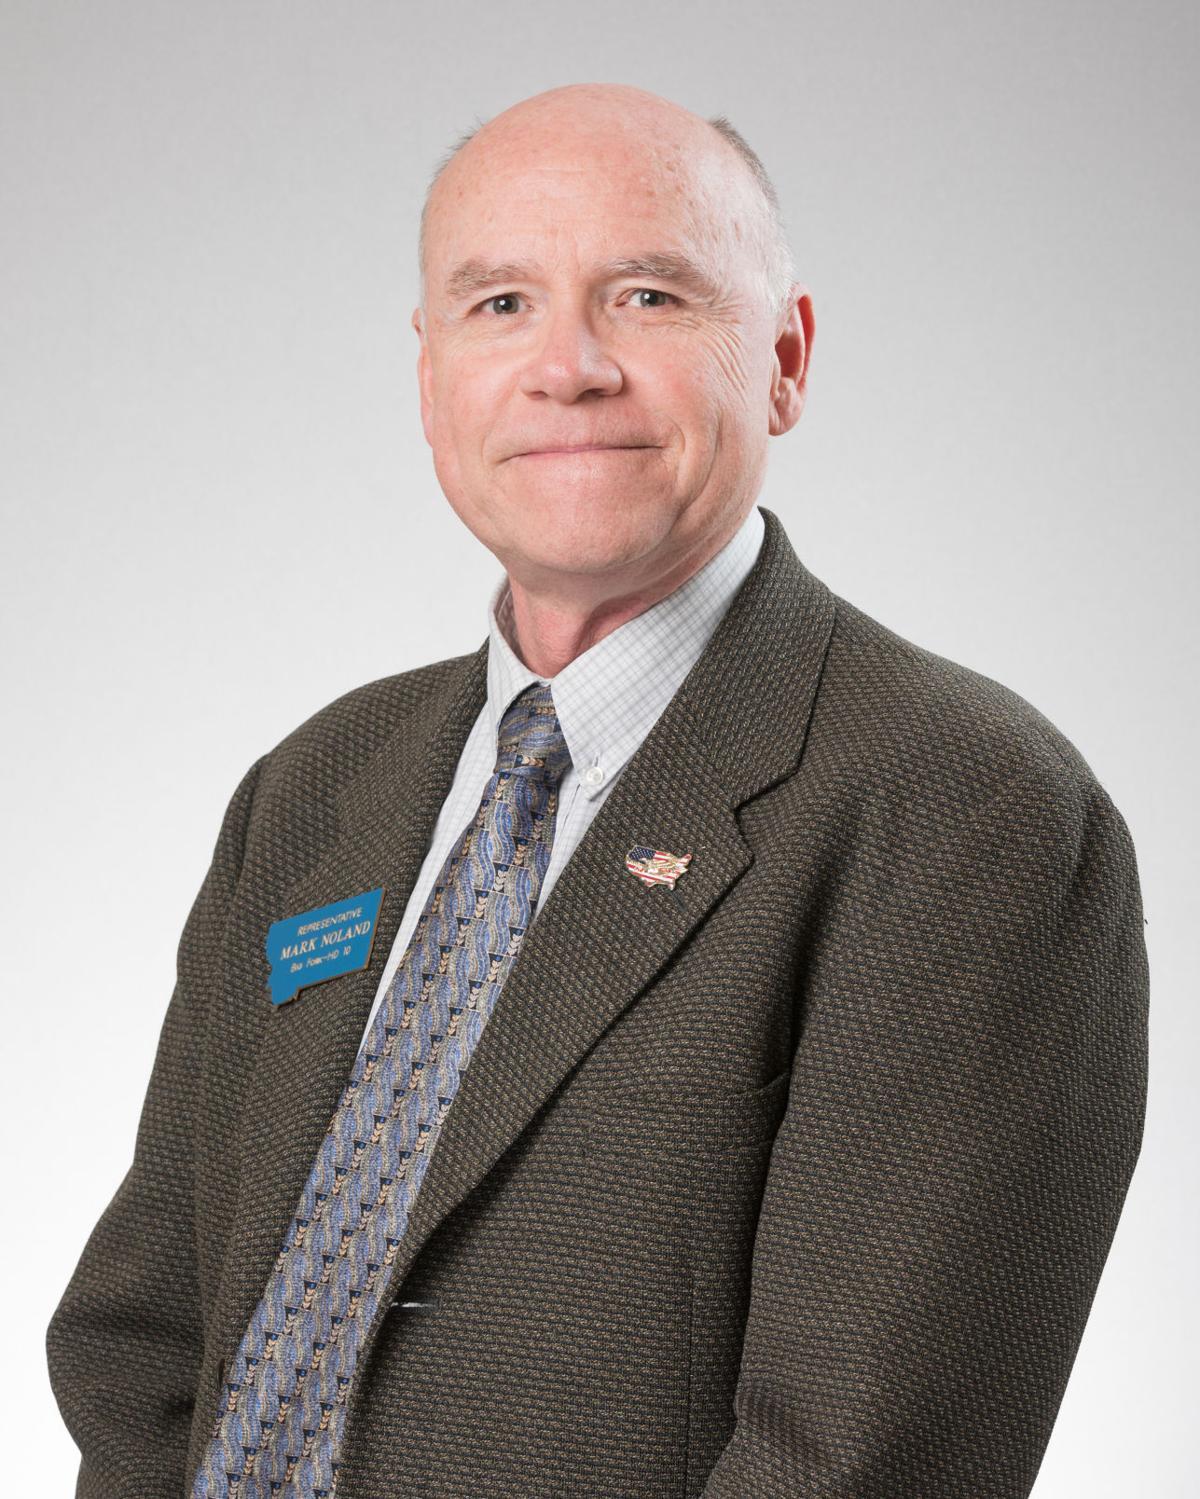 Rep. Mark Noland (mugshot)